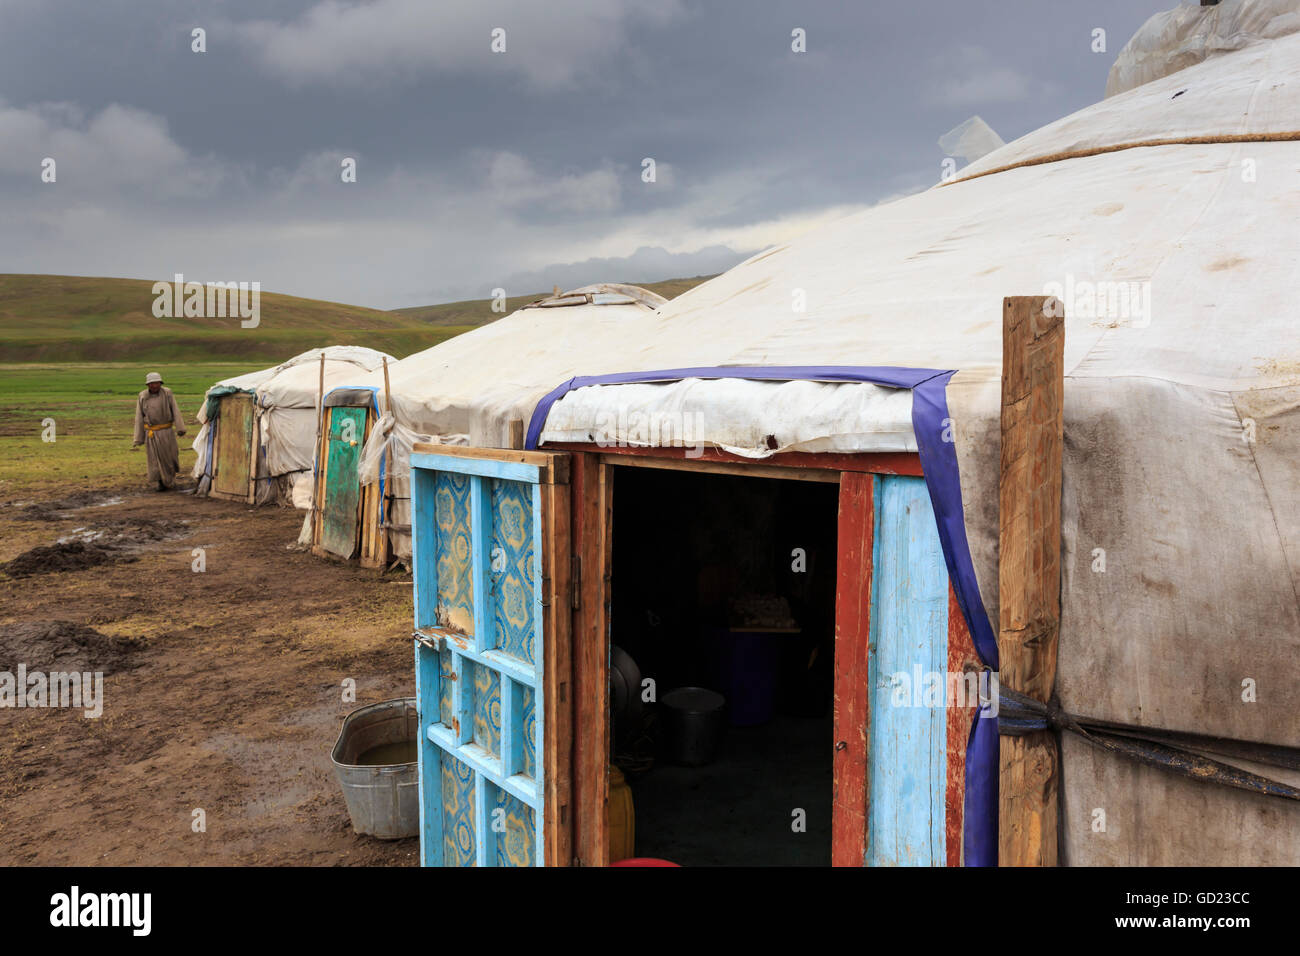 Gers at a Summer nomad camp under dark skies with nomadic man wearing deel, Khujirt, Uvurkhangai (Ovorkhangai), - Stock Image